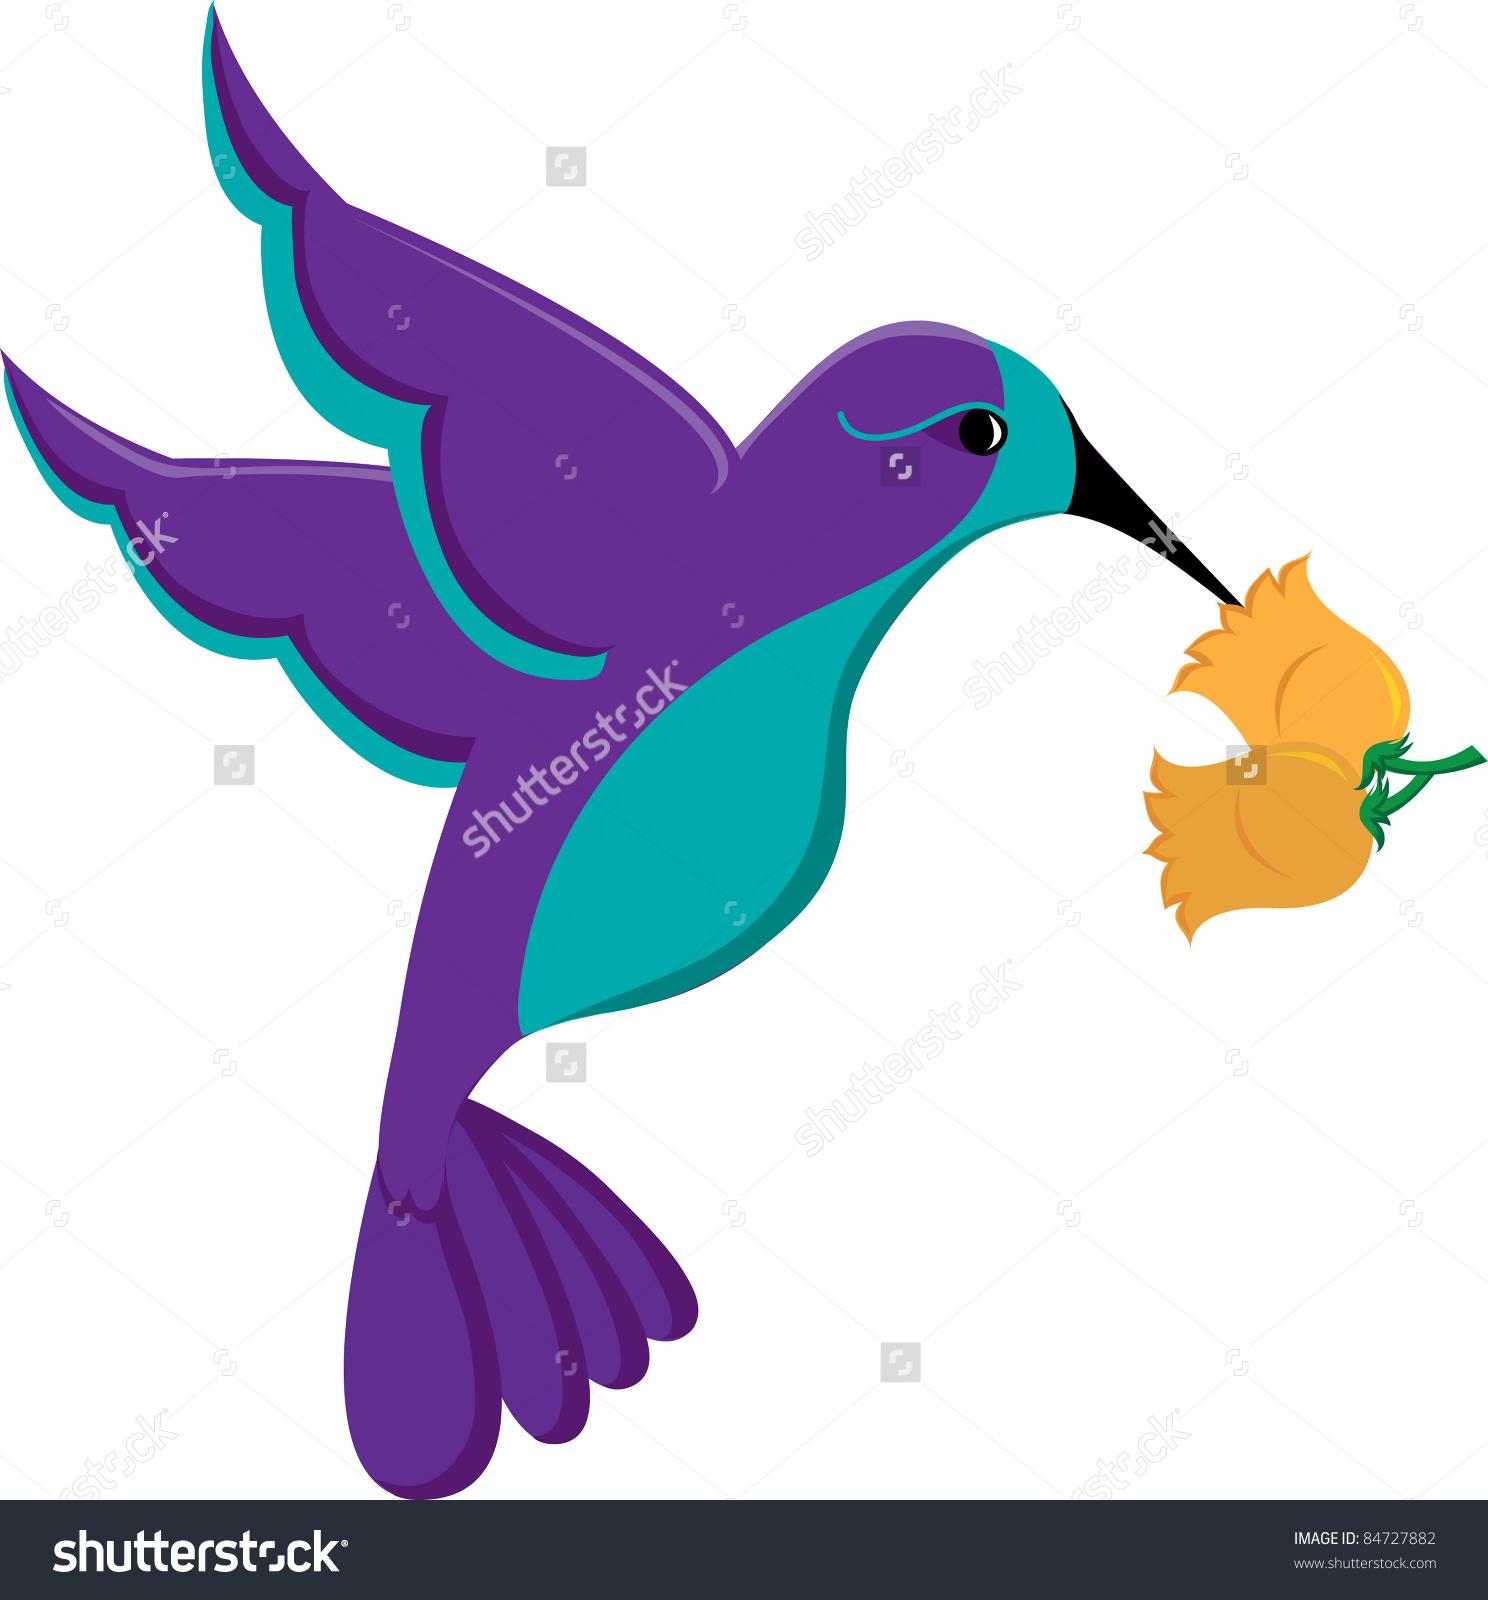 1488x1600 Clip Art Hummingbird Silhouette Clip Art